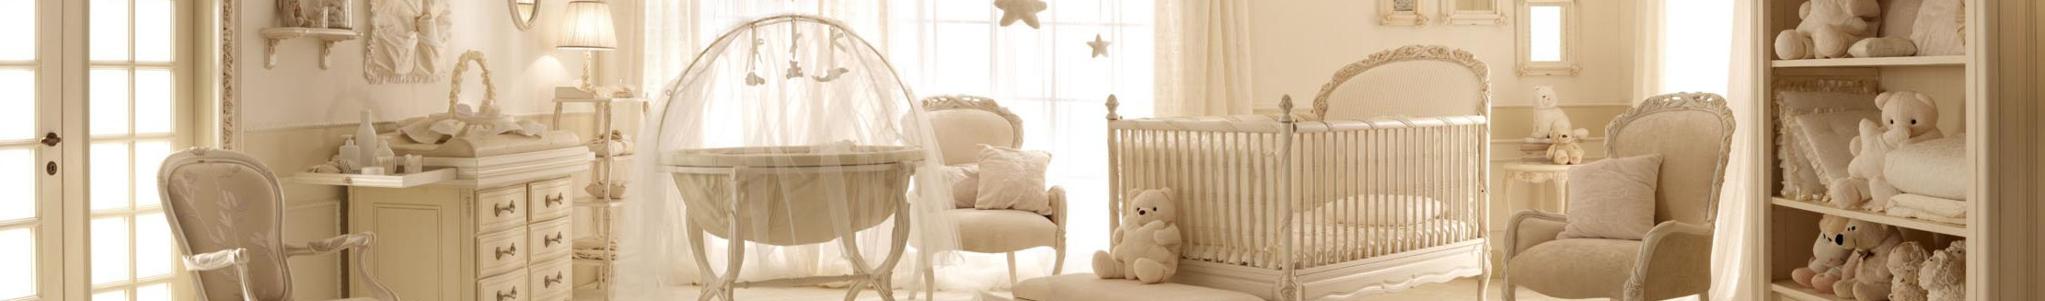 Kinder Ledikant Met Matras.Ledikant Matras Bestellen Happy Sleepers Kindermatrassen